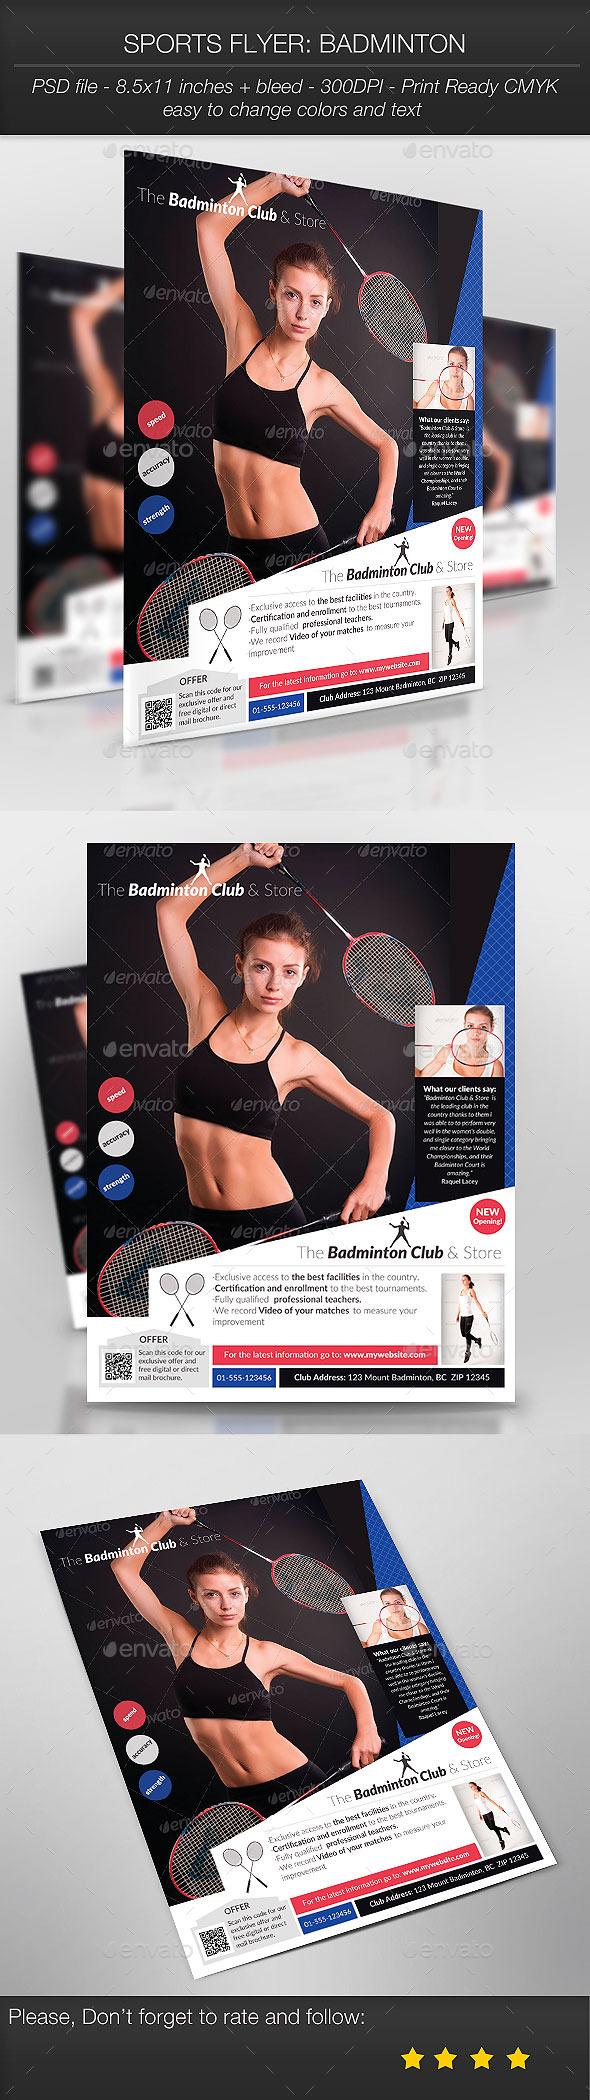 Sports Flyer: Badminton - Sports Events